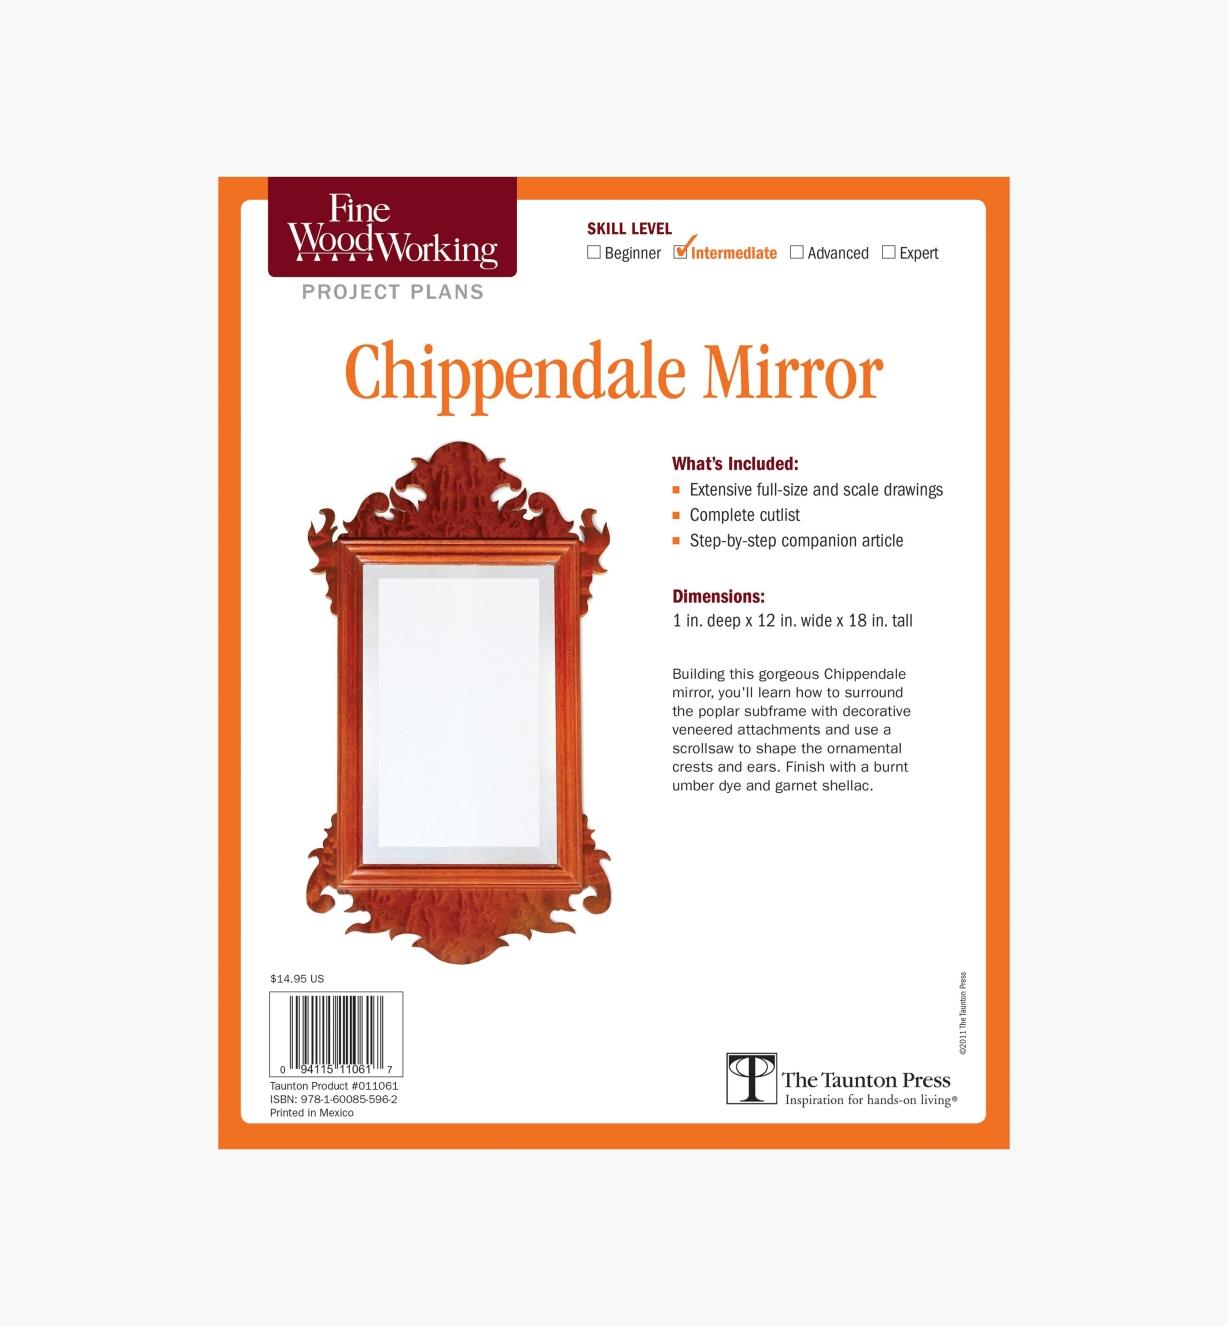 73L2540 - Chippendale Mirror Plan